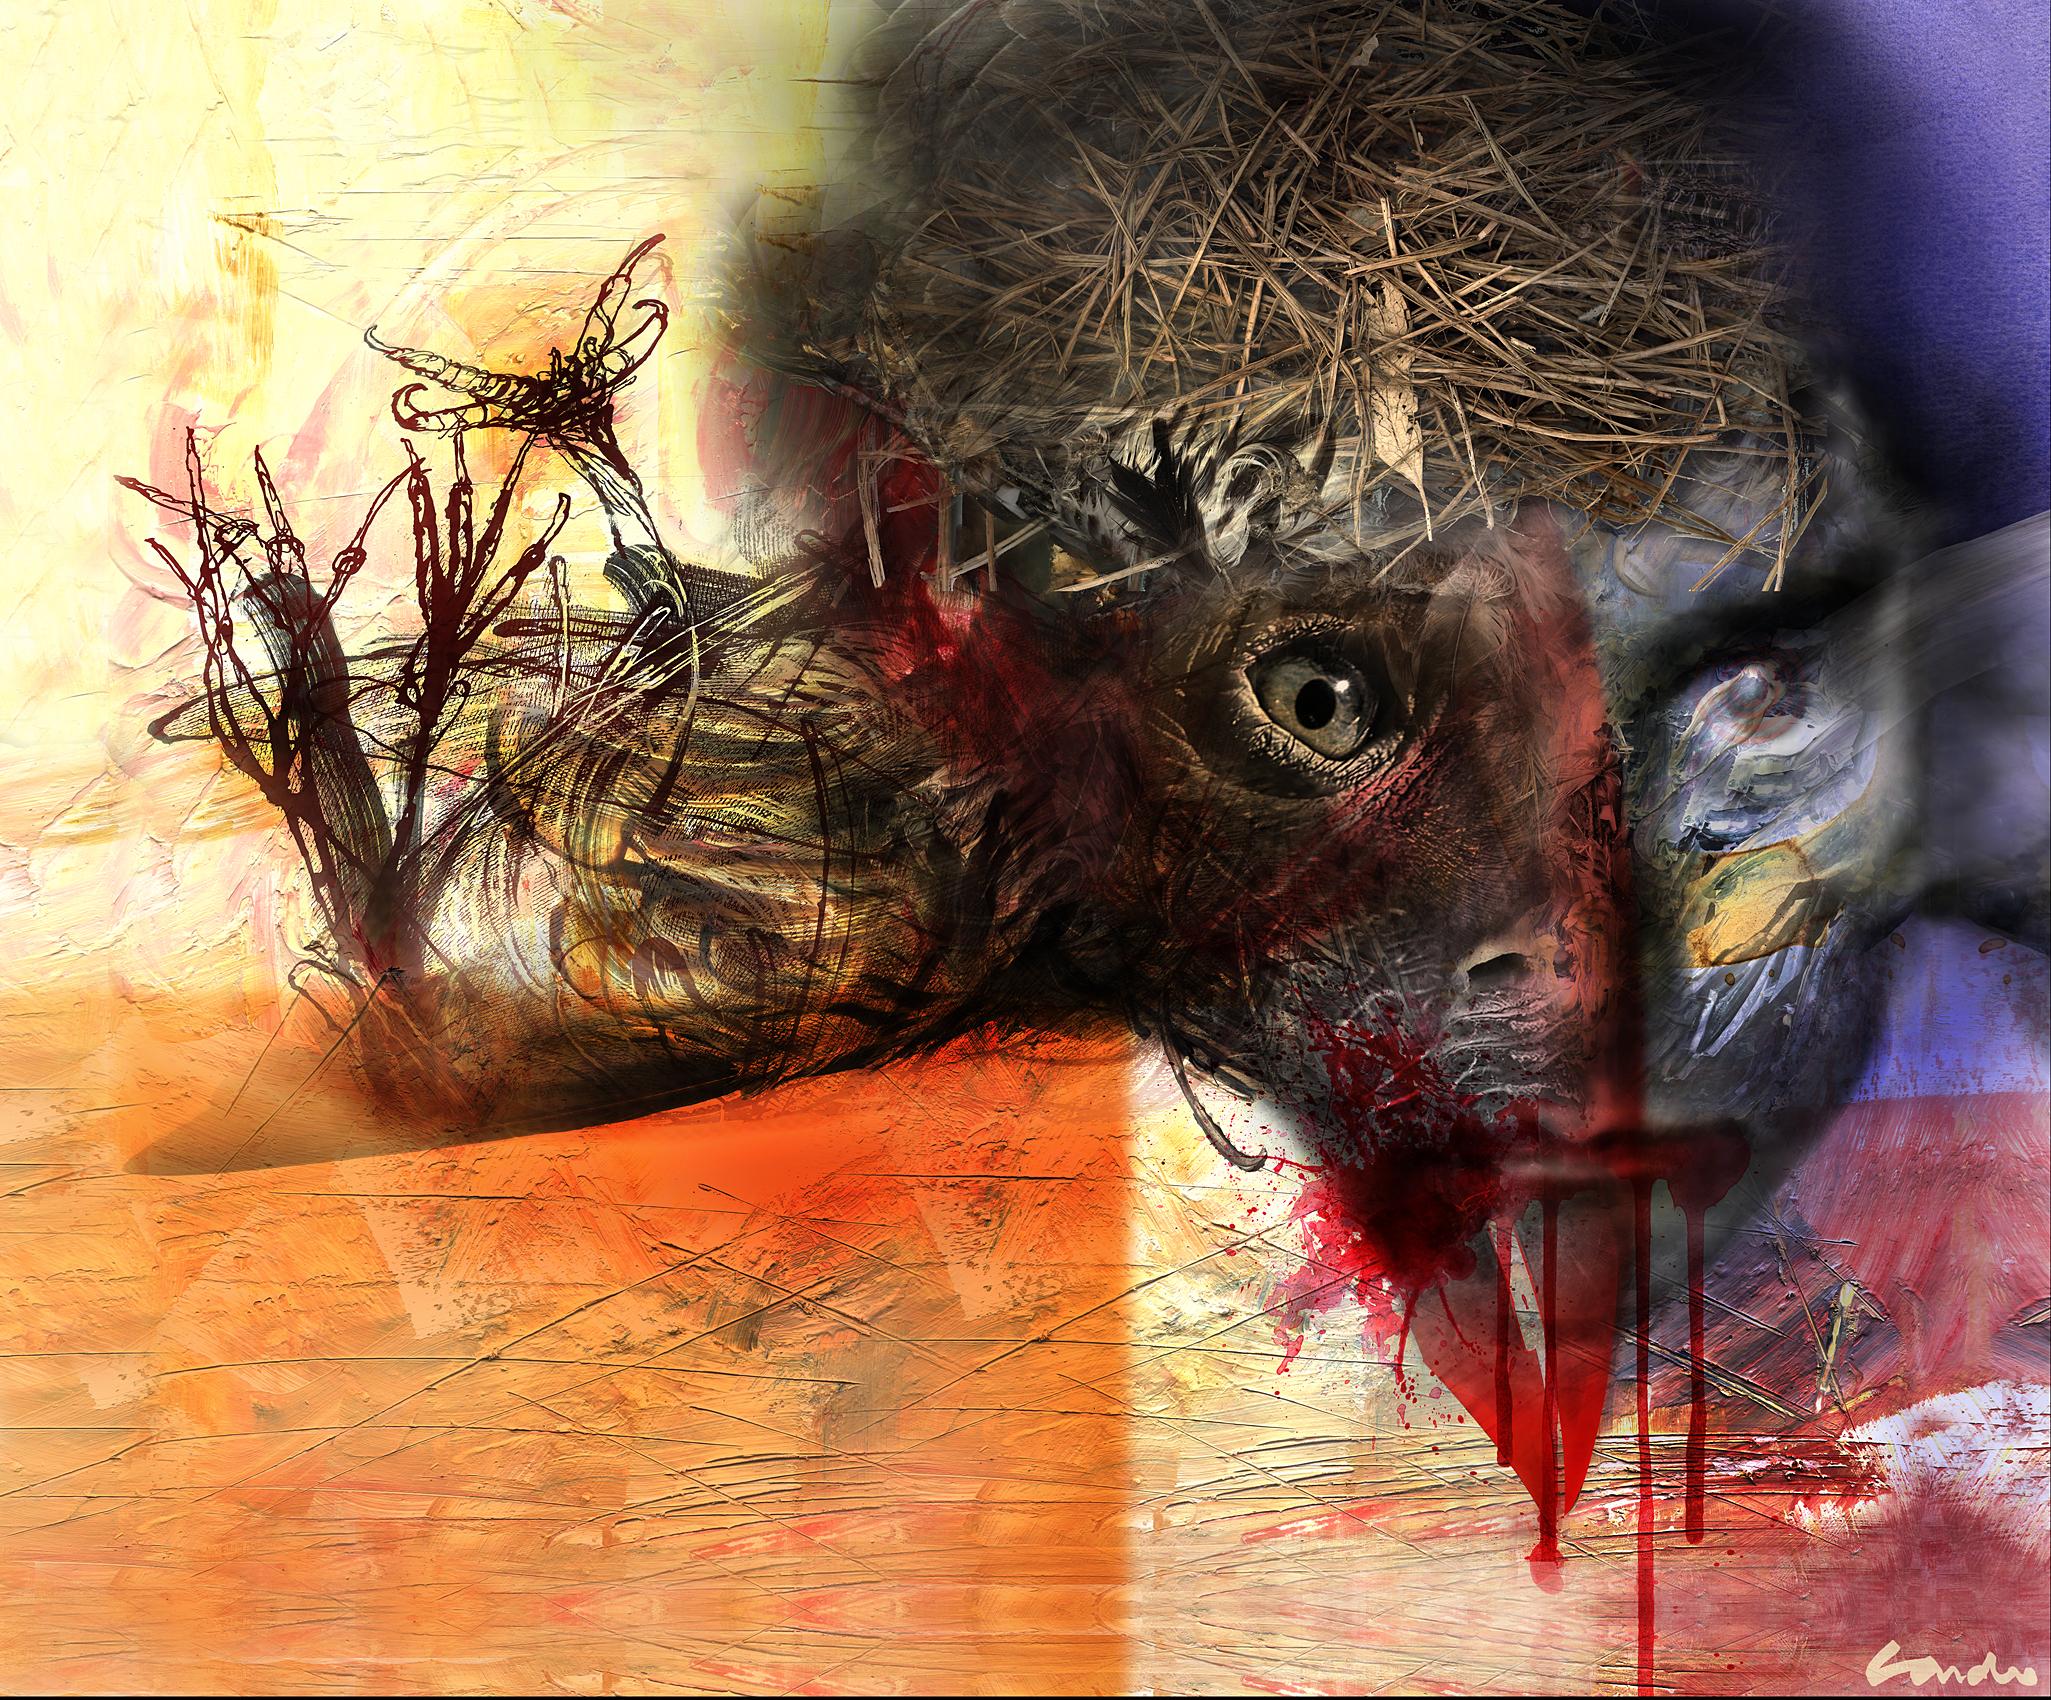 Franz Kafka and his vulture